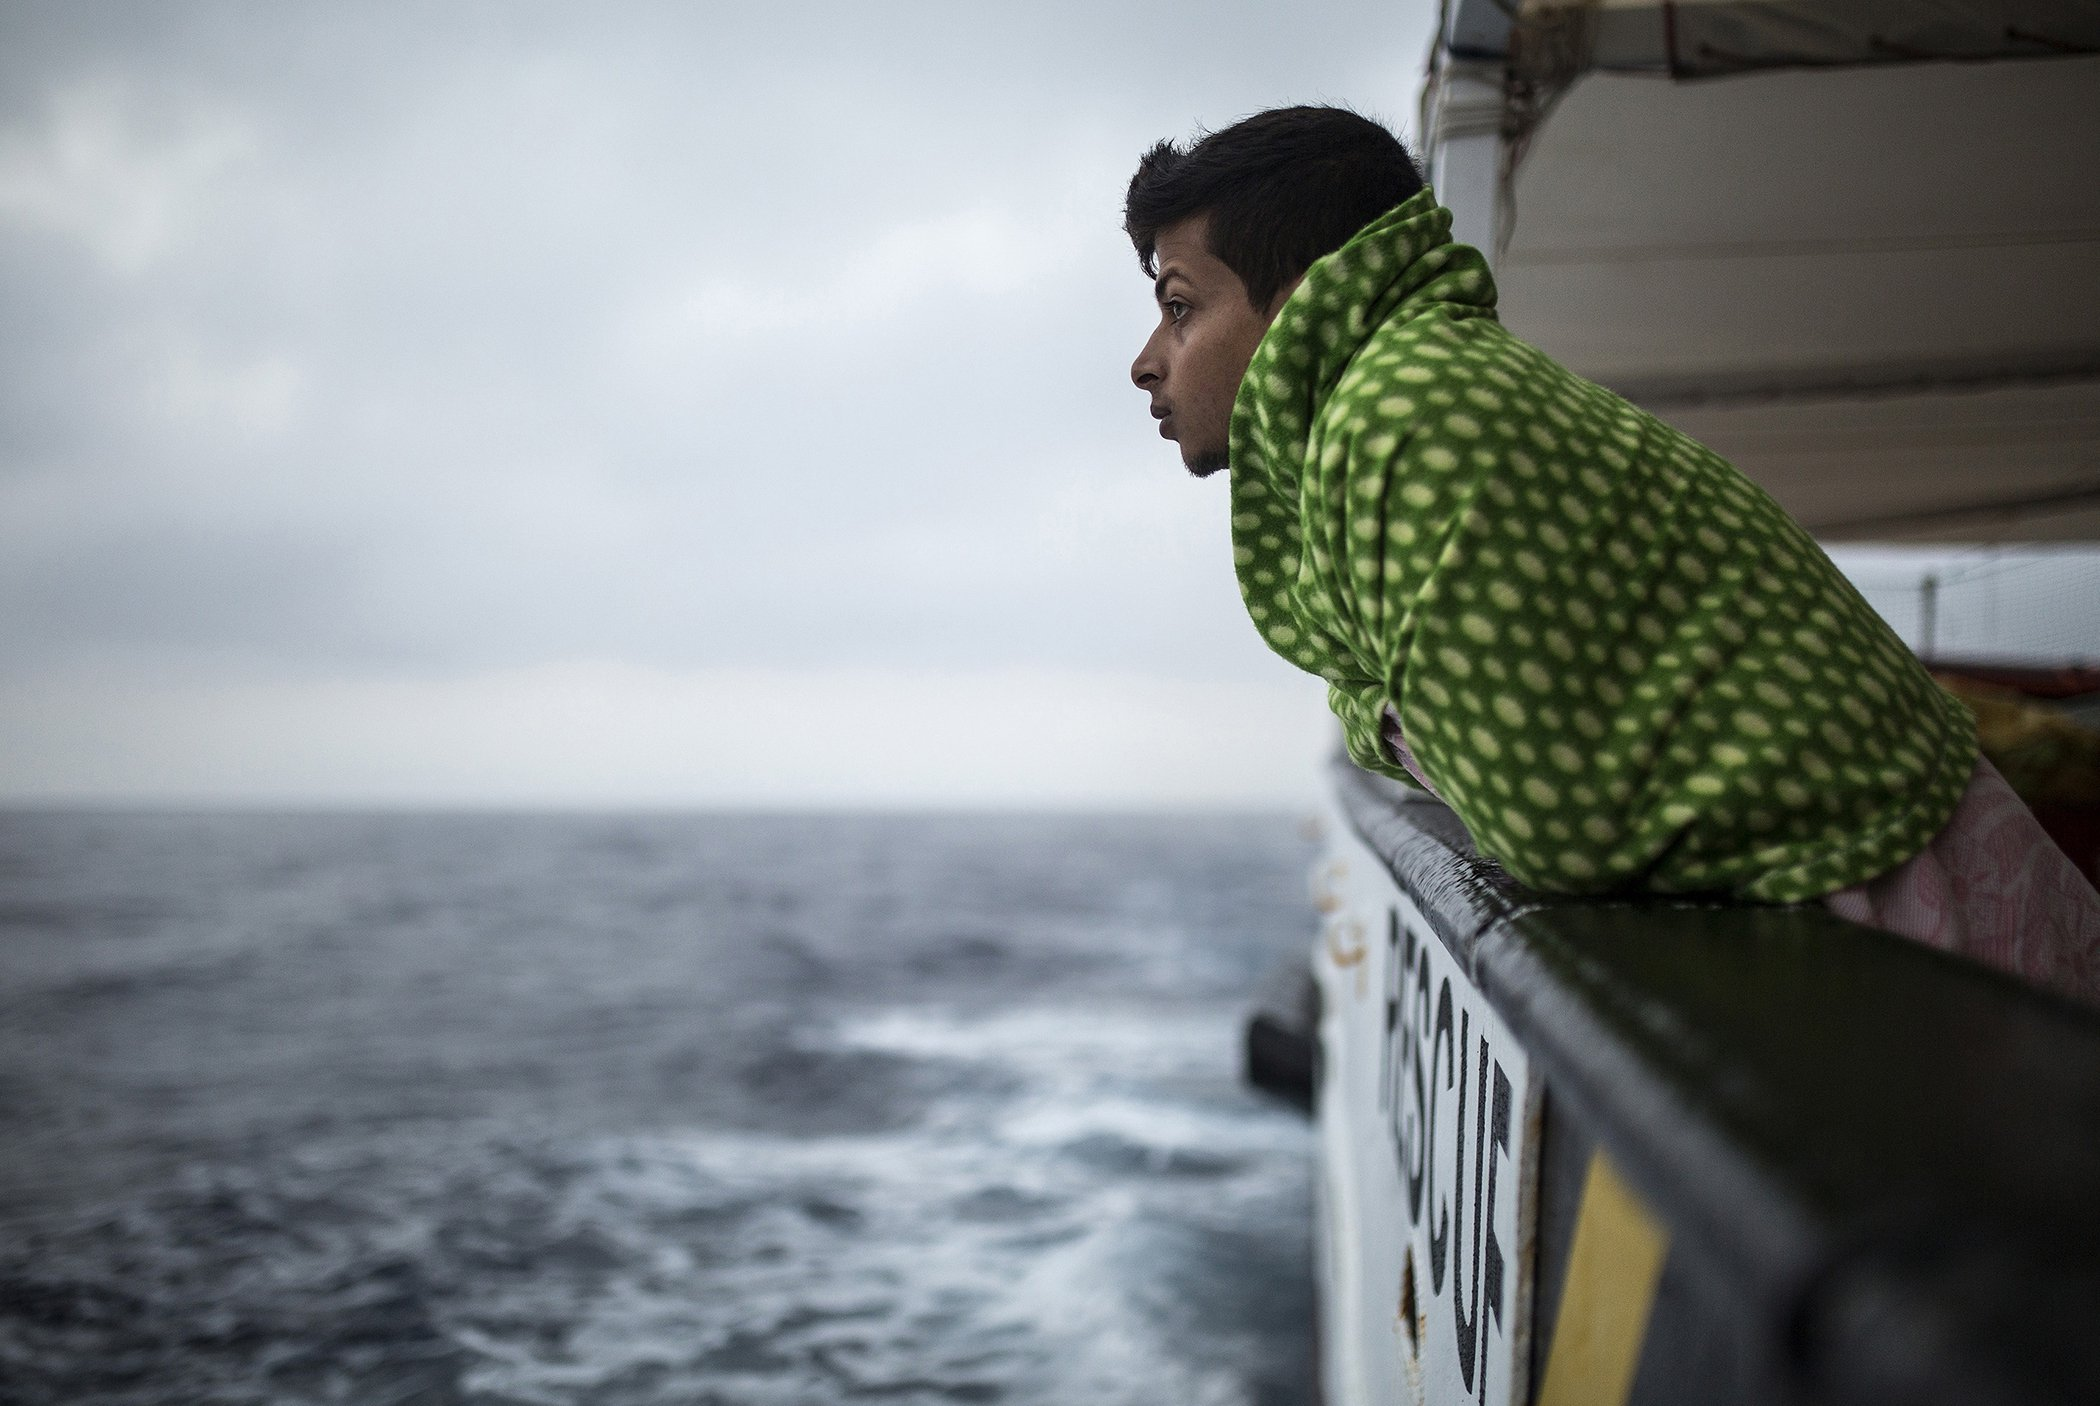 Migrants-Refugee-Mediterranean-Crisis.jpg